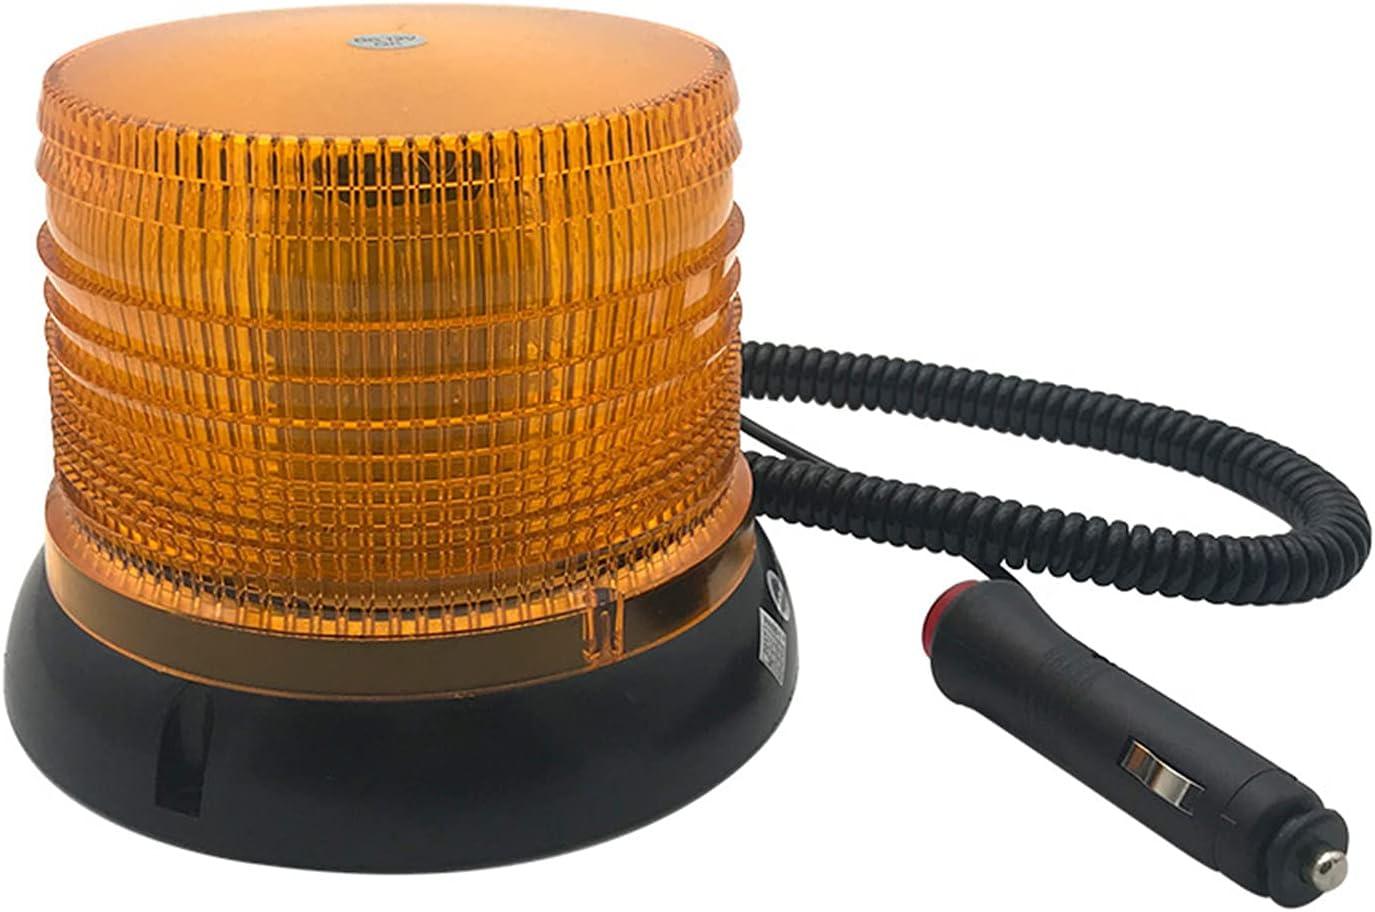 Upupto LED VEHÍCULO DE AUTOMÓVIL LED Luz de Advertencia Transpulsor Lámpara de Emergencia montada en Beacon Magnético 12 / 24V